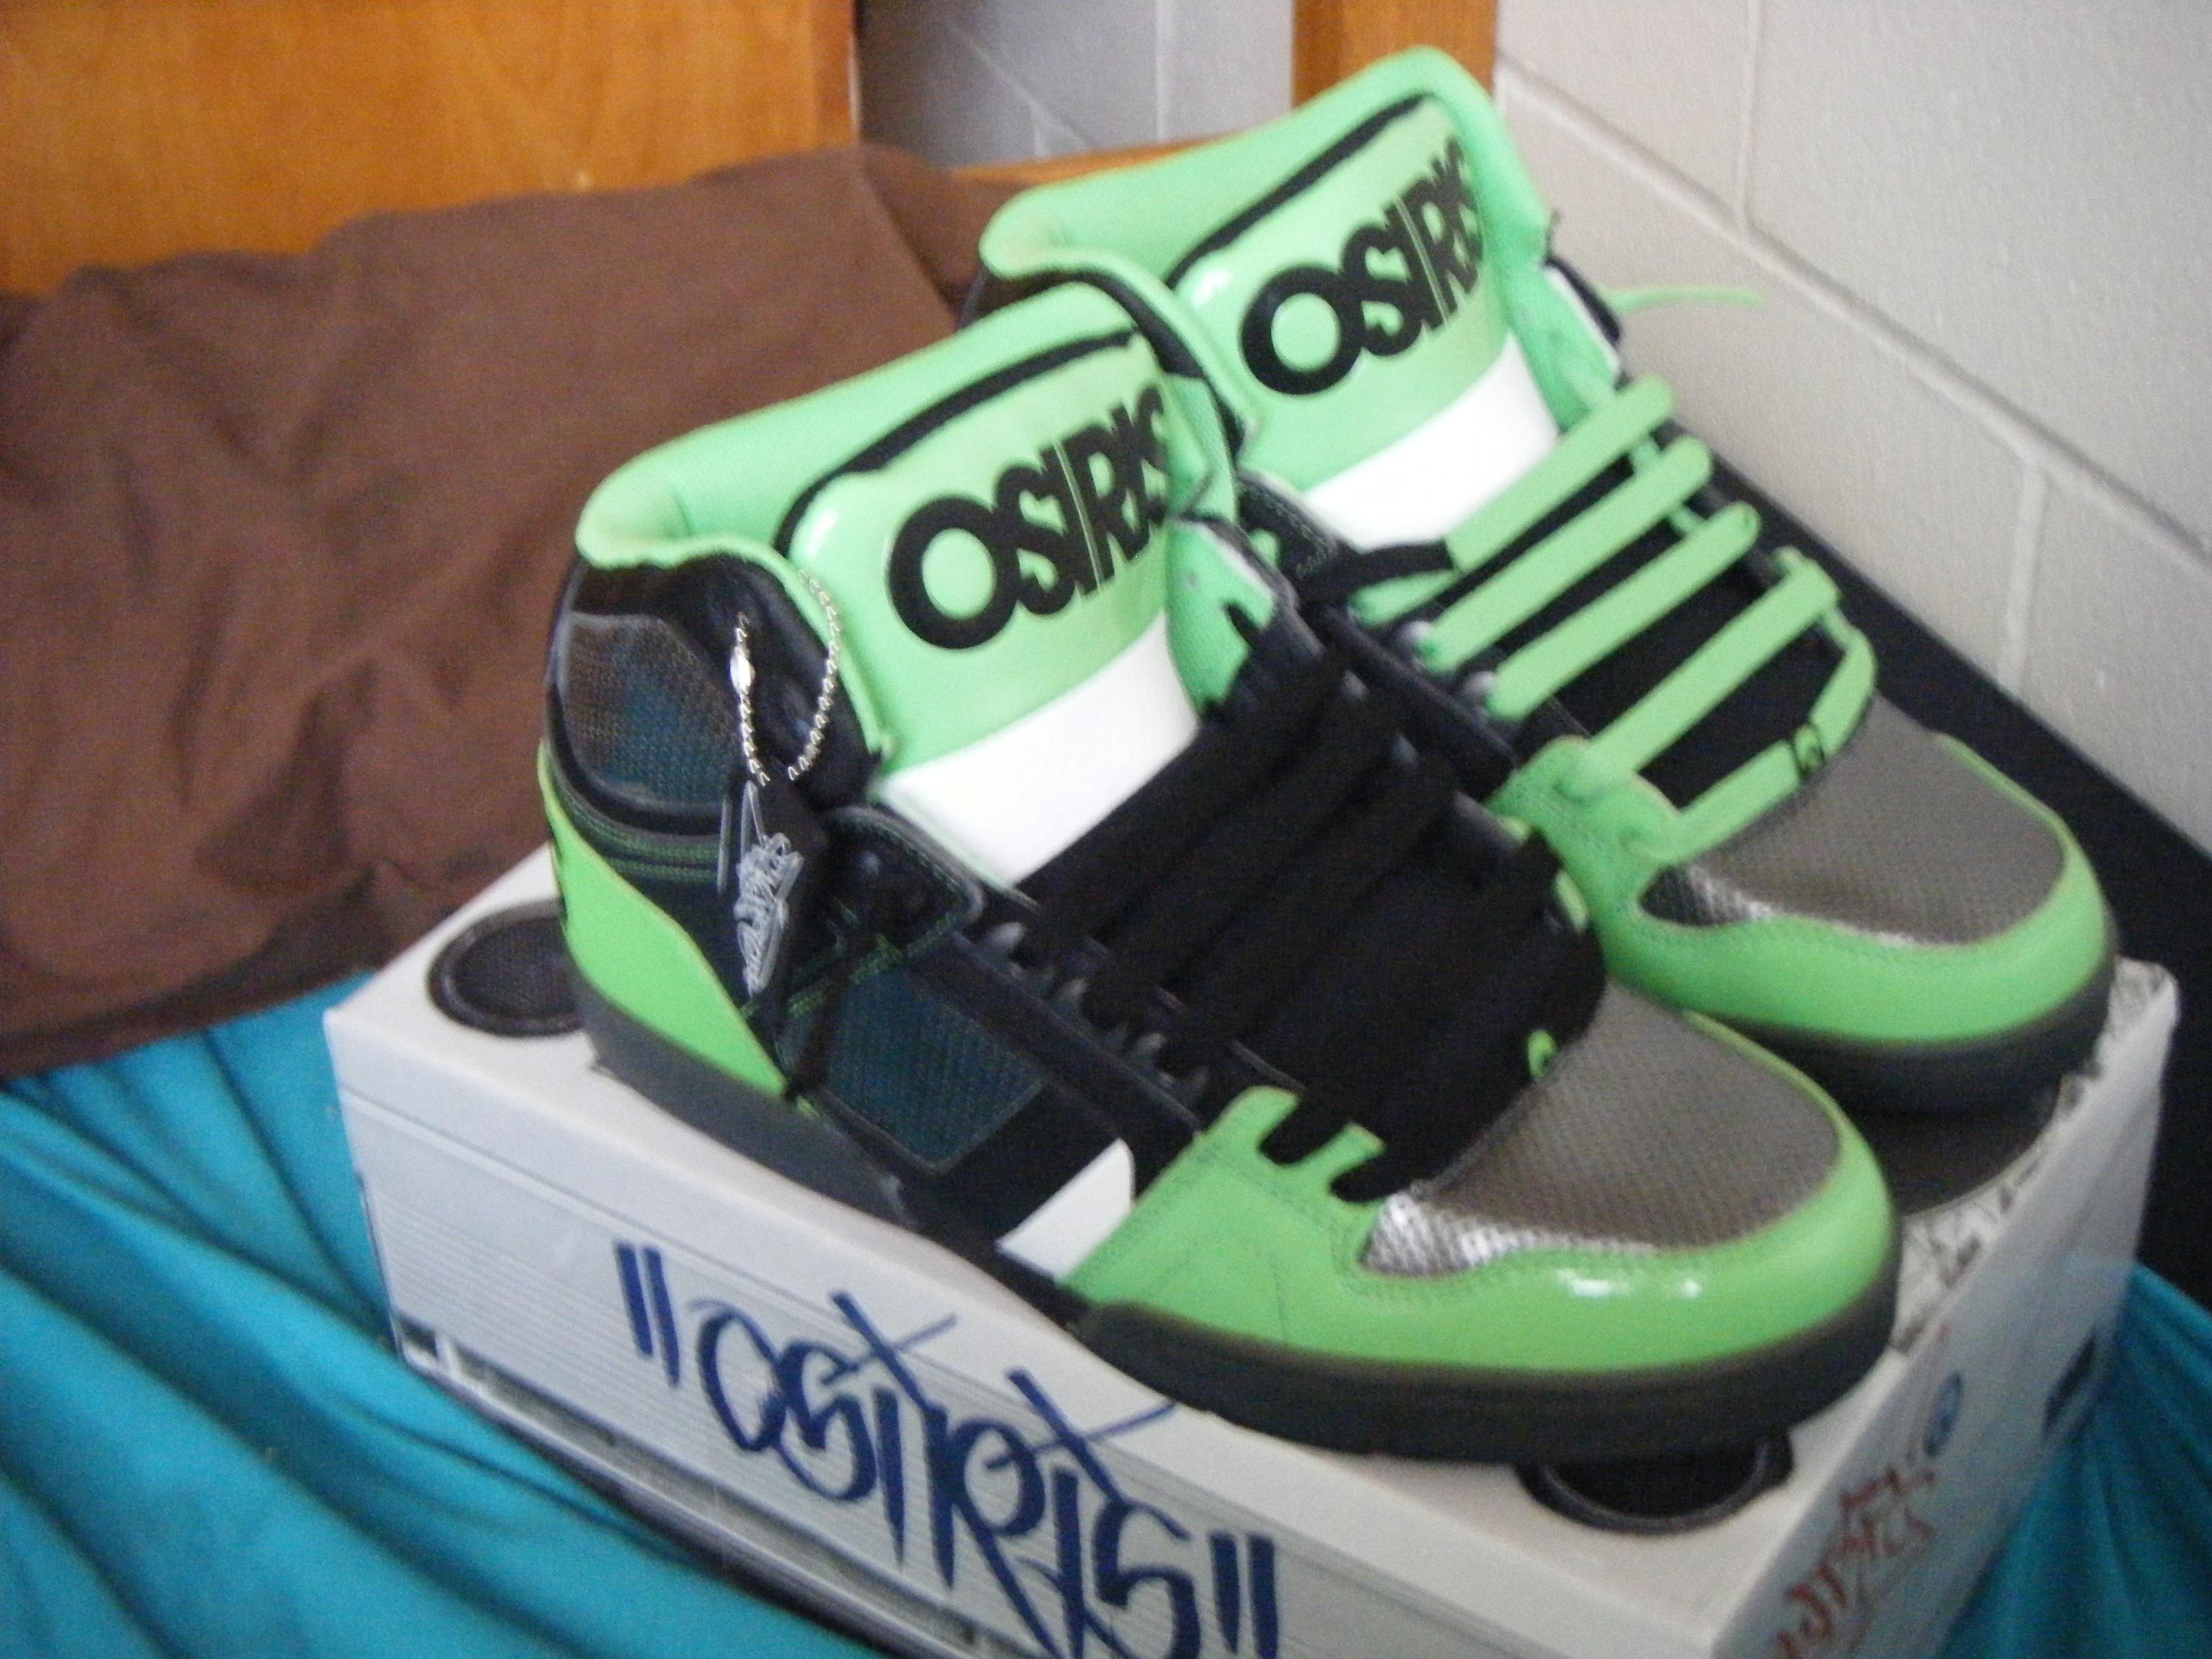 c2b9d48f9b3 File:Osiris NYC 83 shoes.jpg - Wikimedia Commons